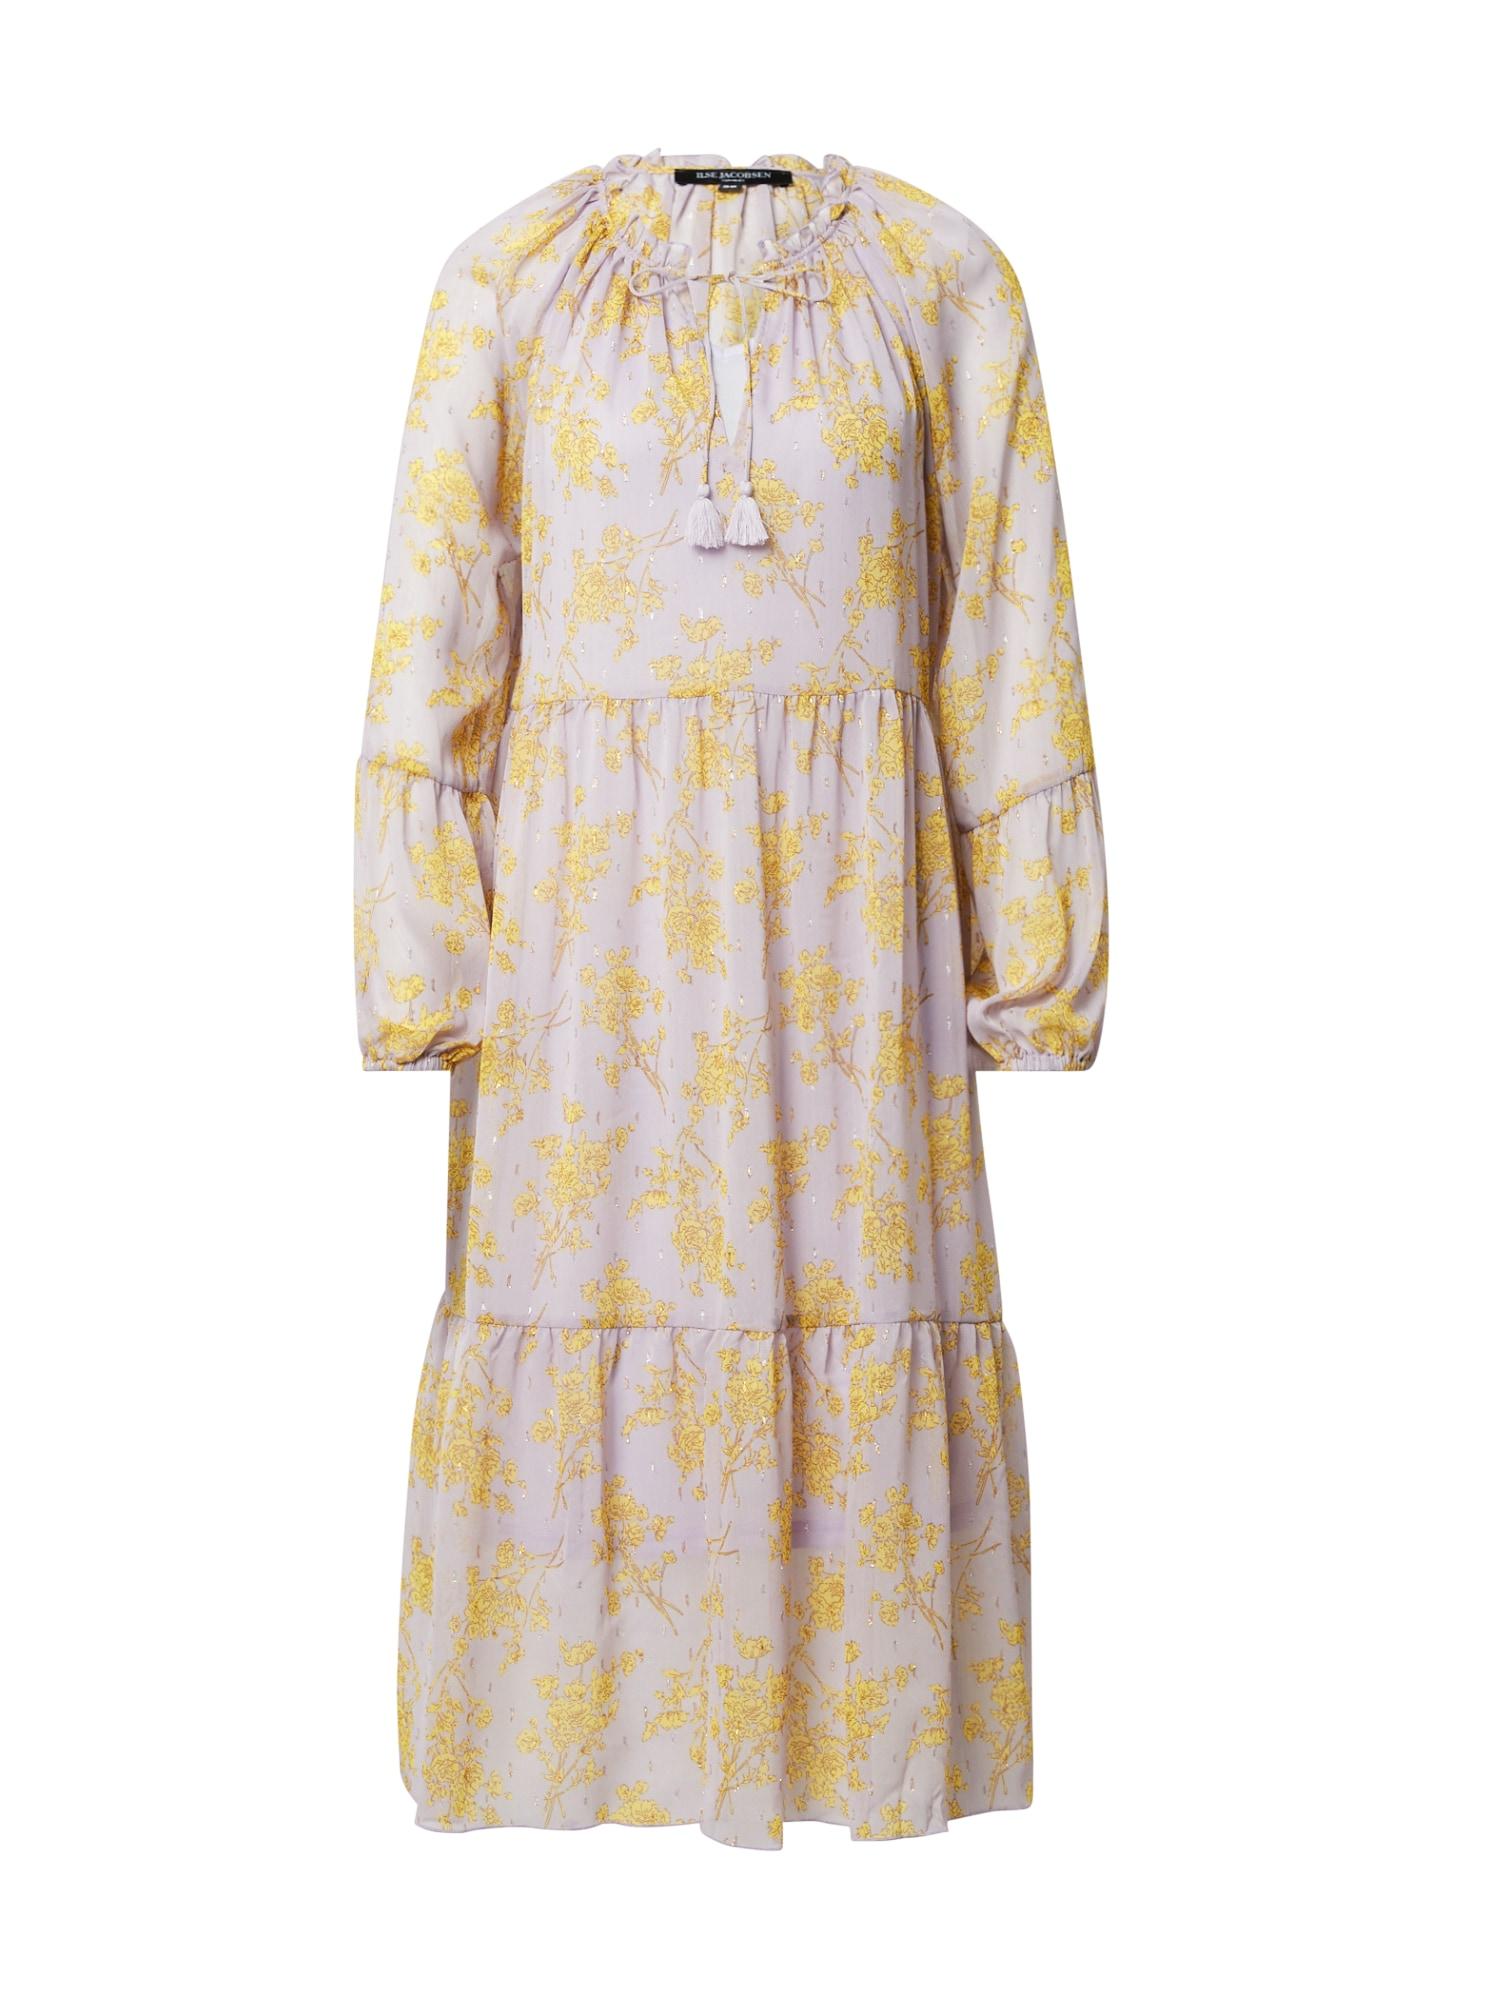 ILSE JACOBSEN Suknelė rožių spalva / geltona